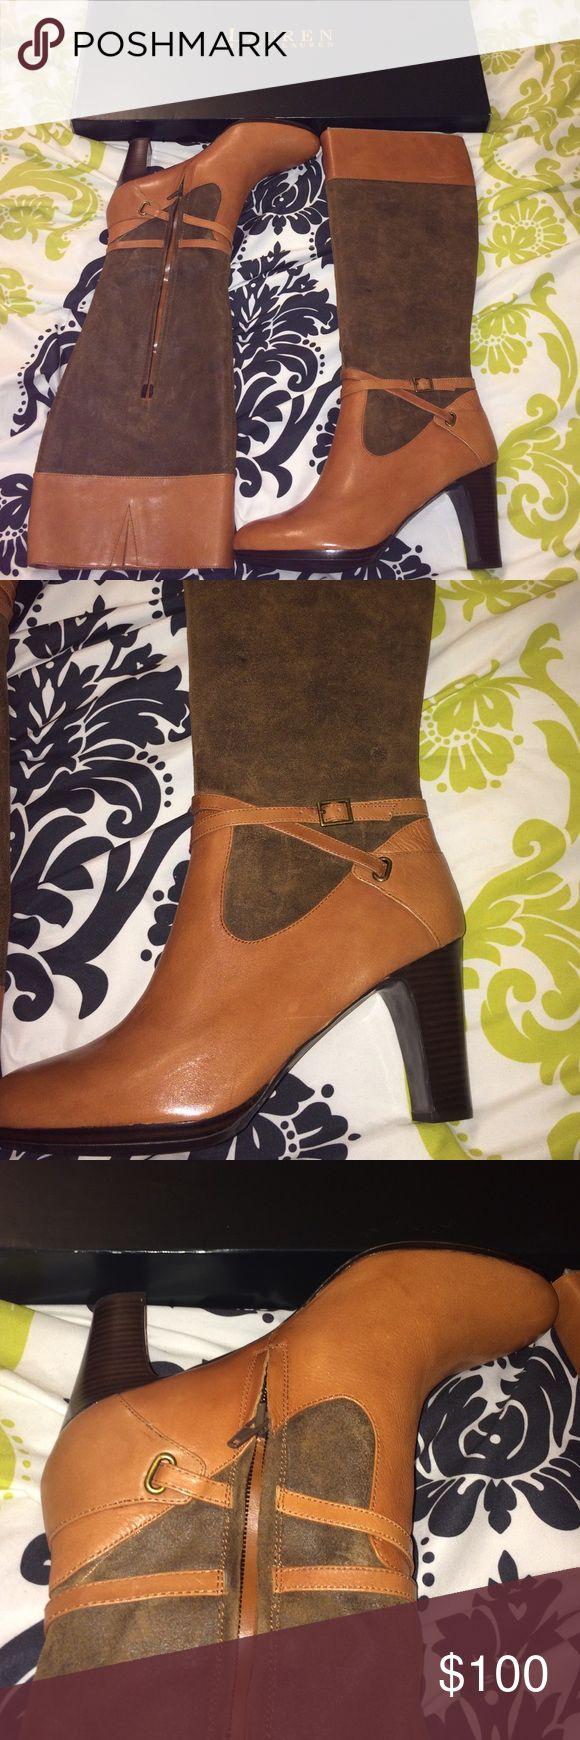 🆕📍LAURAN Ralph Lauren Brown/tan Heeled boots 10 Ralph Lauren Vachetta/ Oiled Suede. FRESH OUT THE BOOK‼️🎉🤗 NEVER WORN ‼️ 3 inch chunky heels. Lauren Ralph Lauren Shoes Heeled Boots